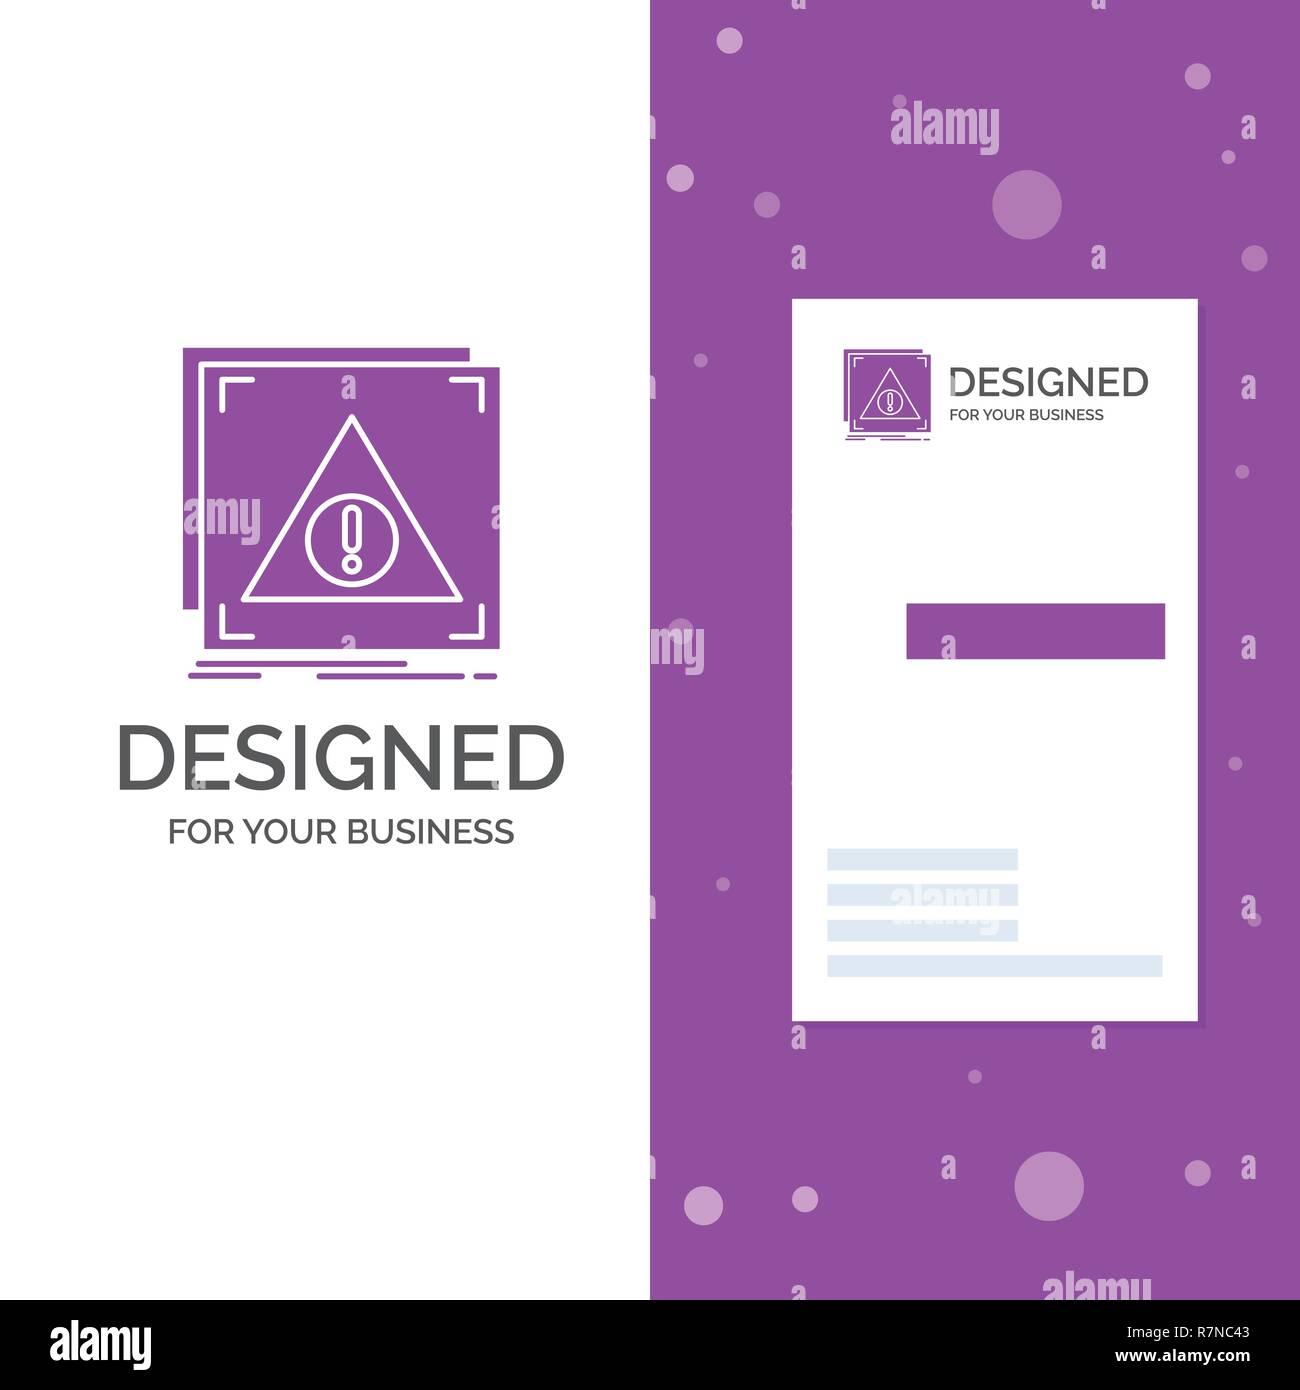 Business Logo for Error, Application, Denied, server, alert. Vertical Purple Business / Visiting Card template. Creative background vector illustratio - Stock Image